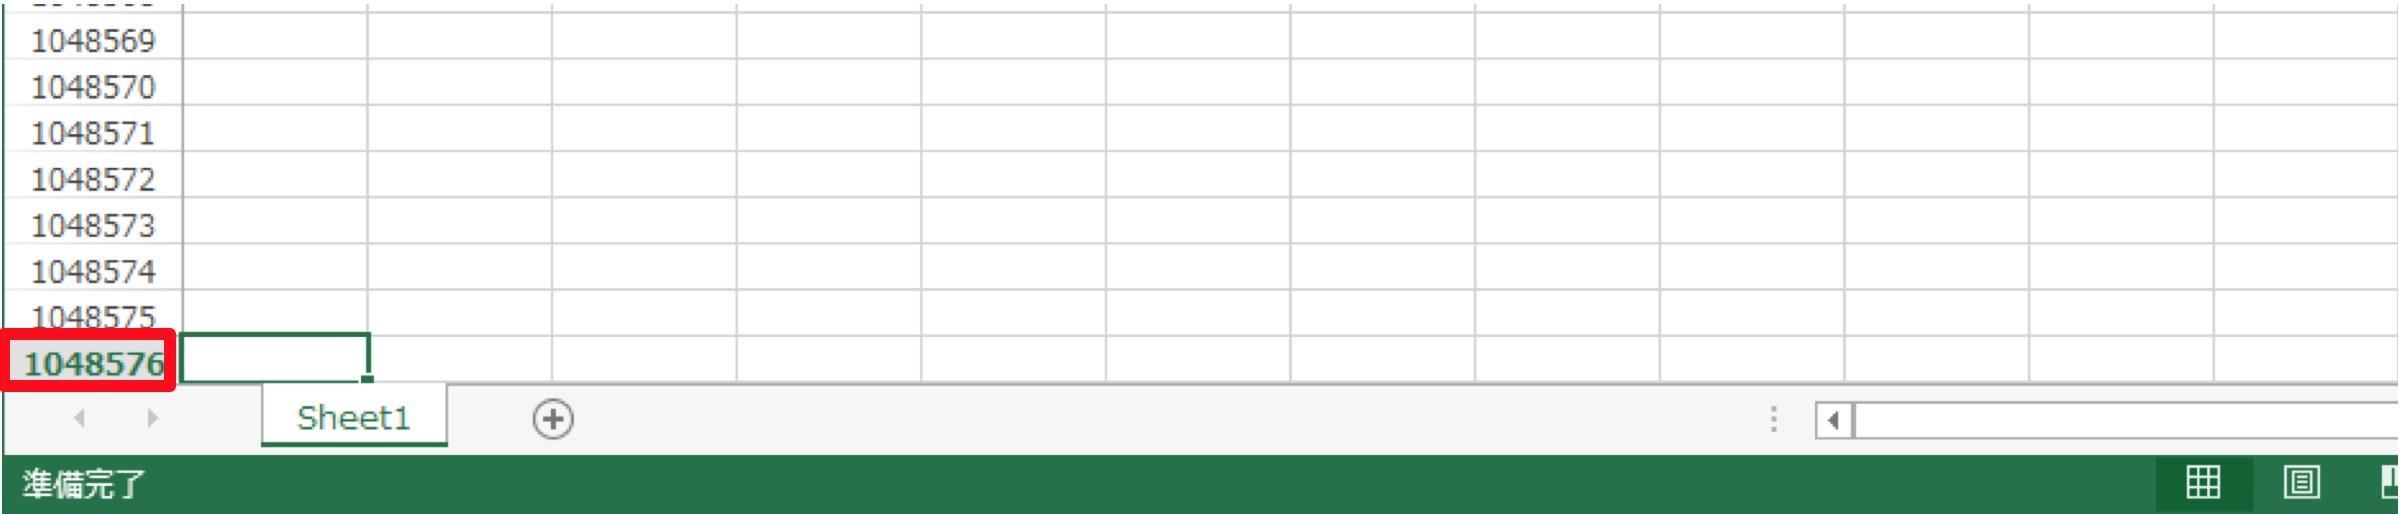 Excelワークシートの構成1